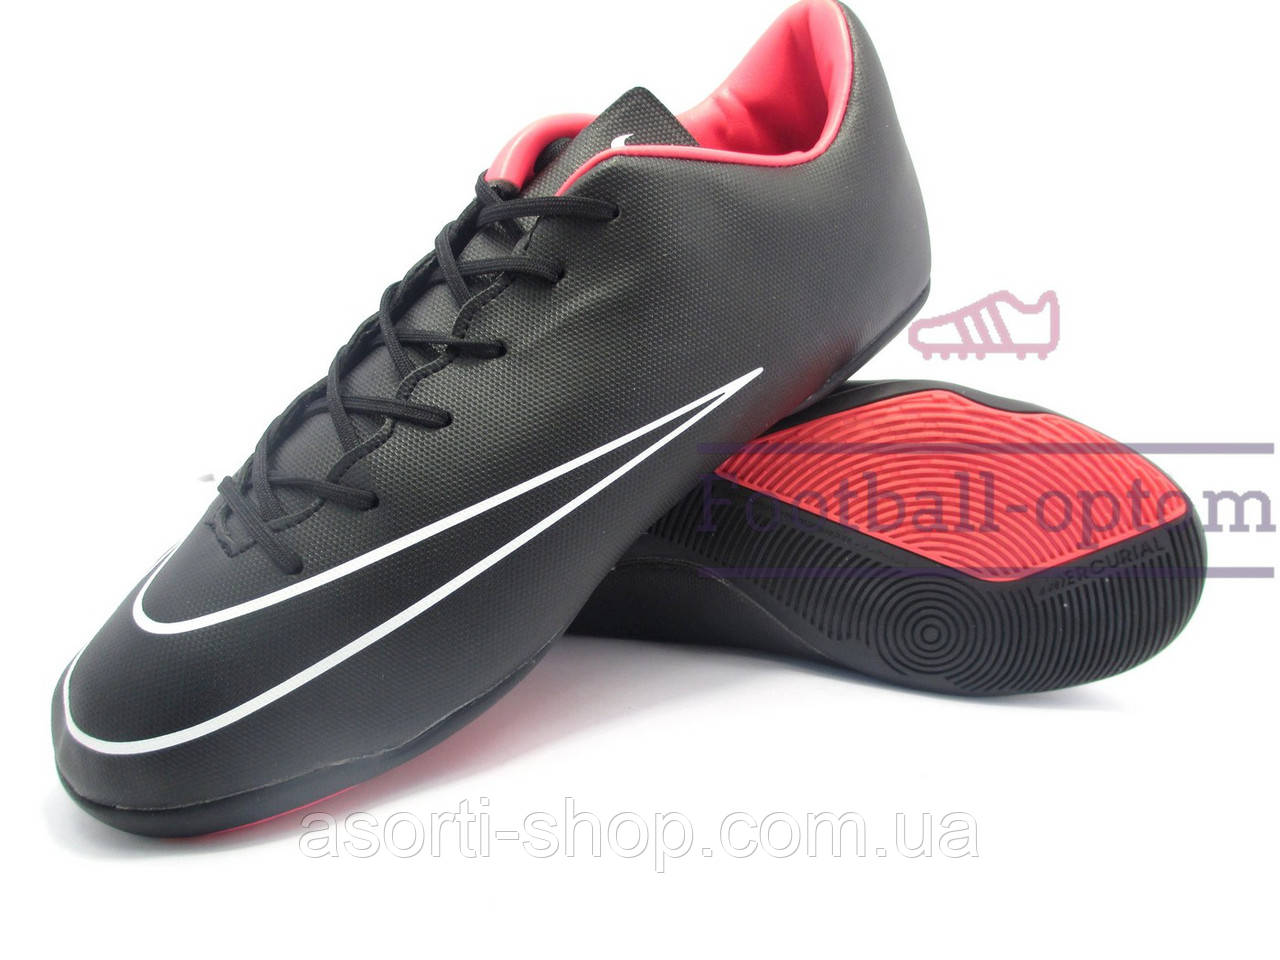 5b6a5e73 Футзалки найк (бампы),Nike Mercurial - Интернет-магазин